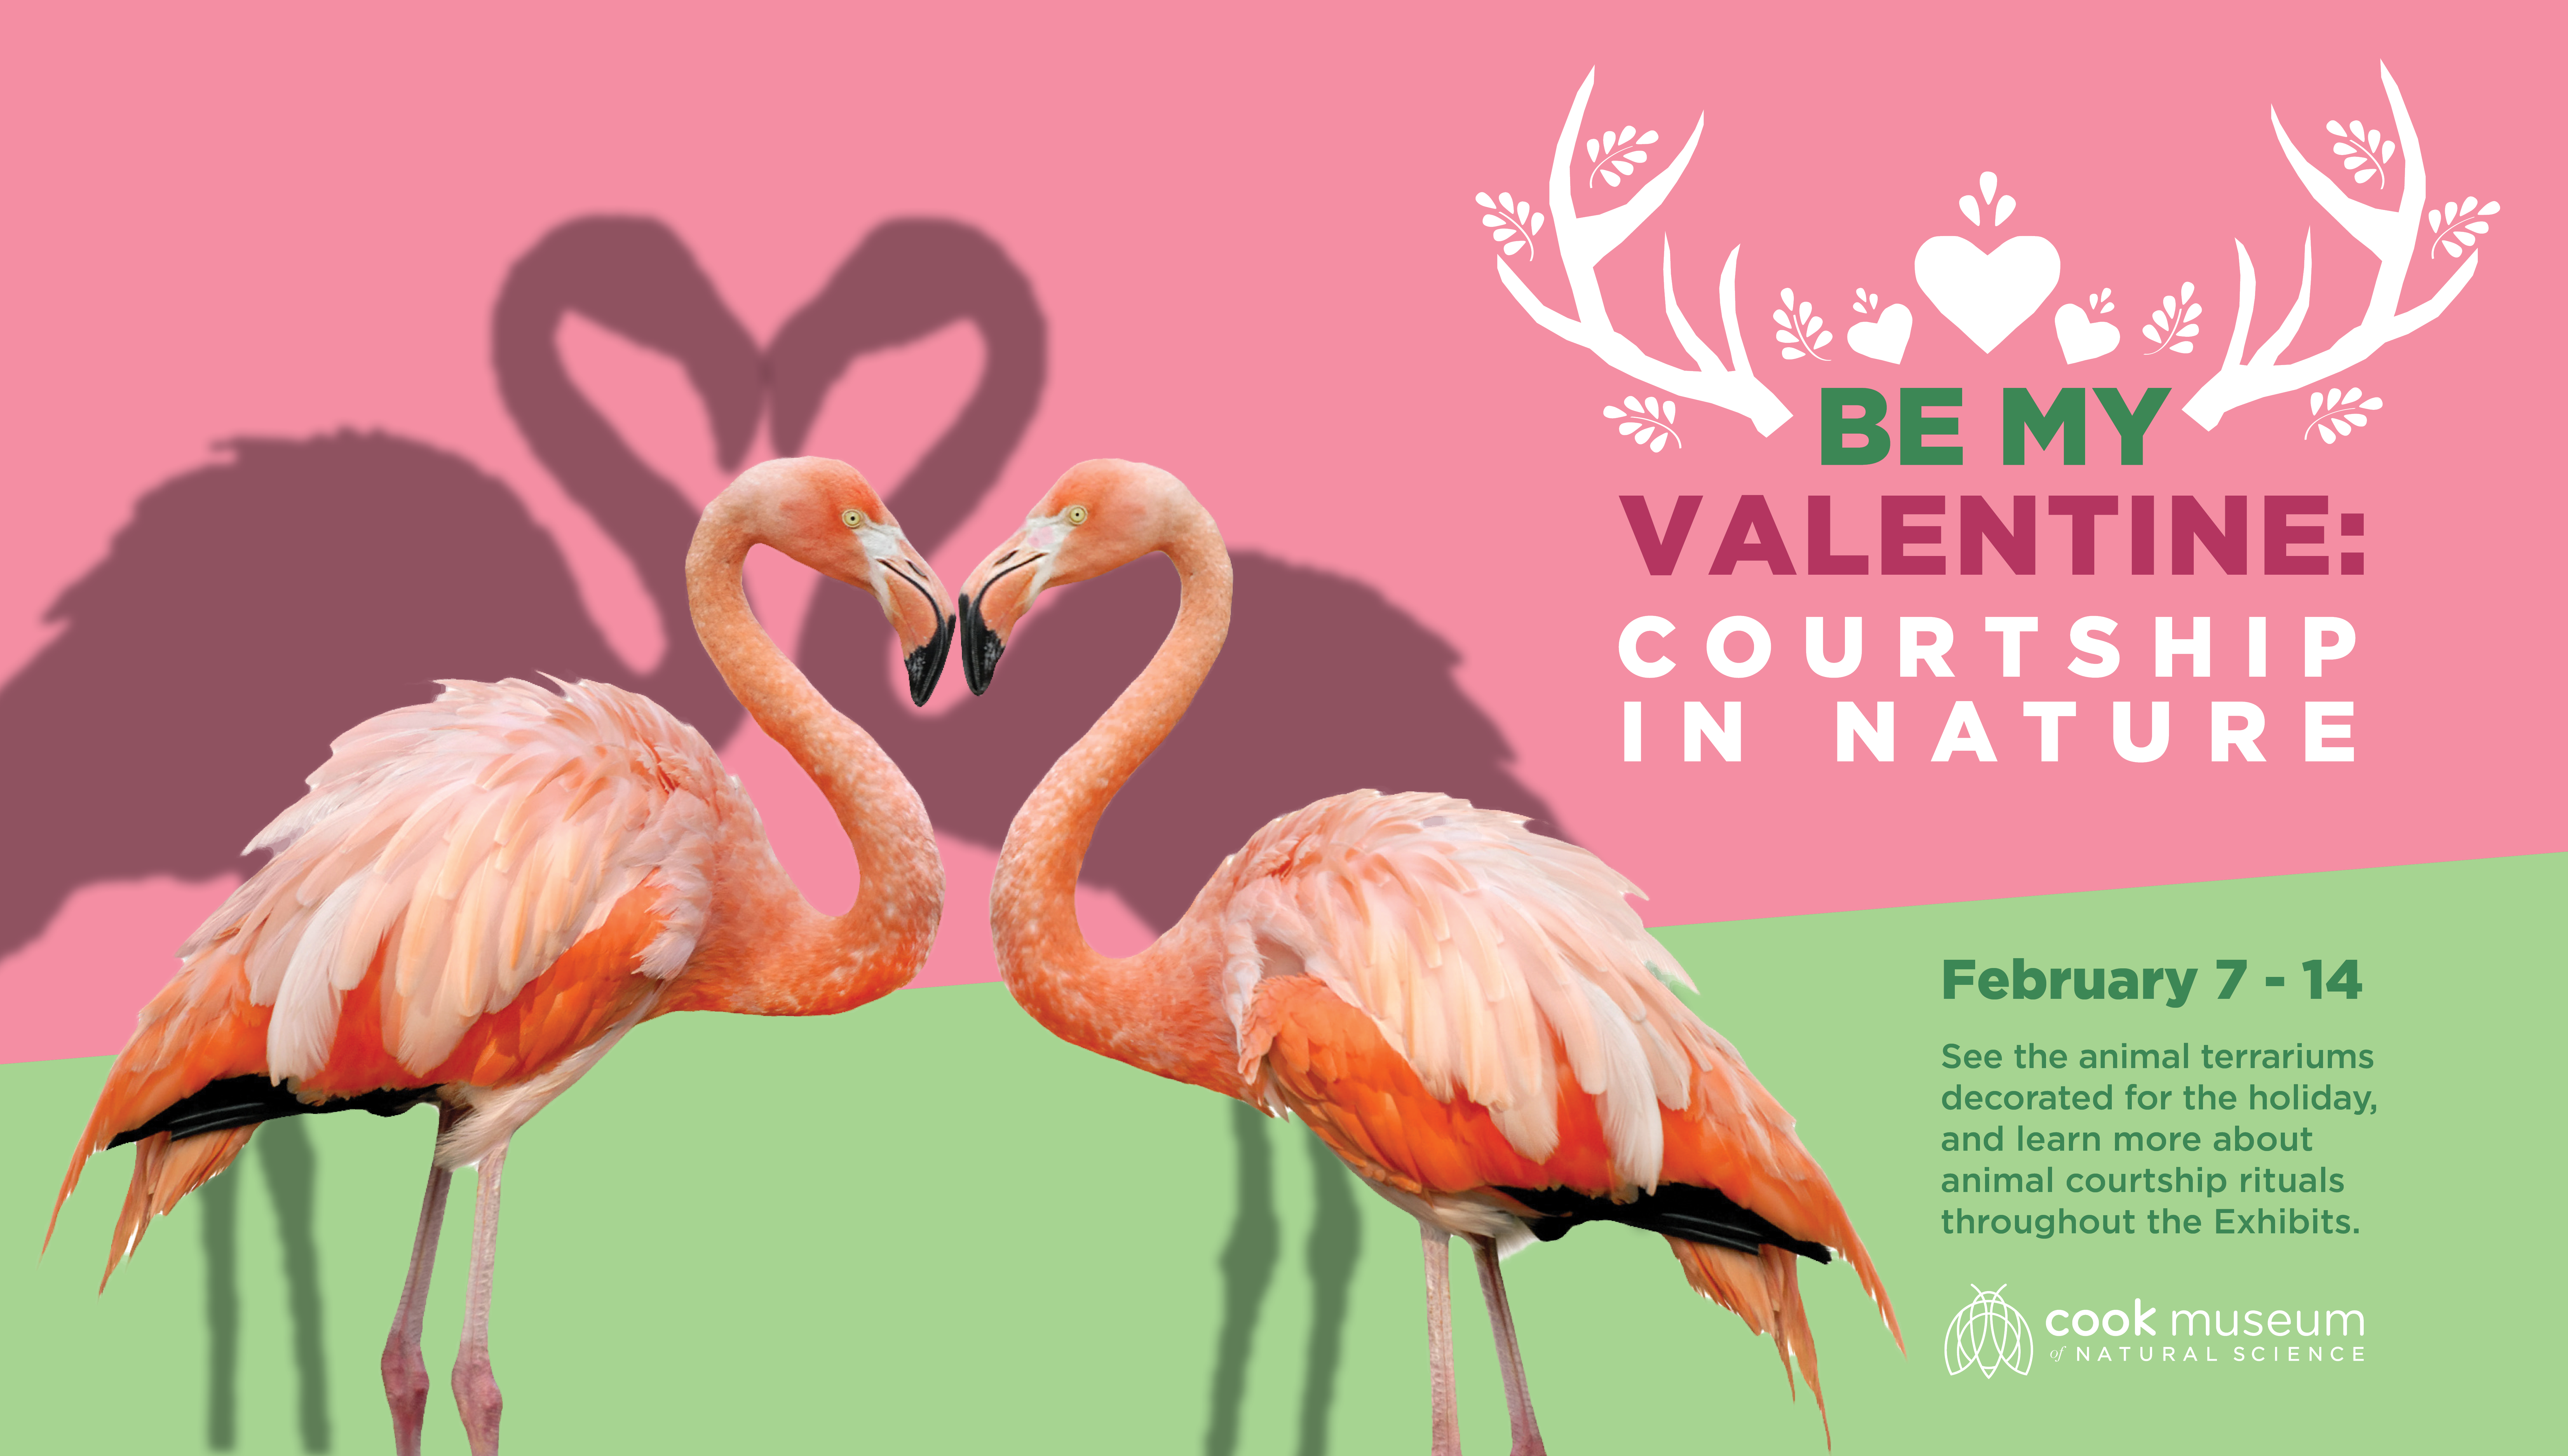 Be My Valentine: Animal Courtship Facts